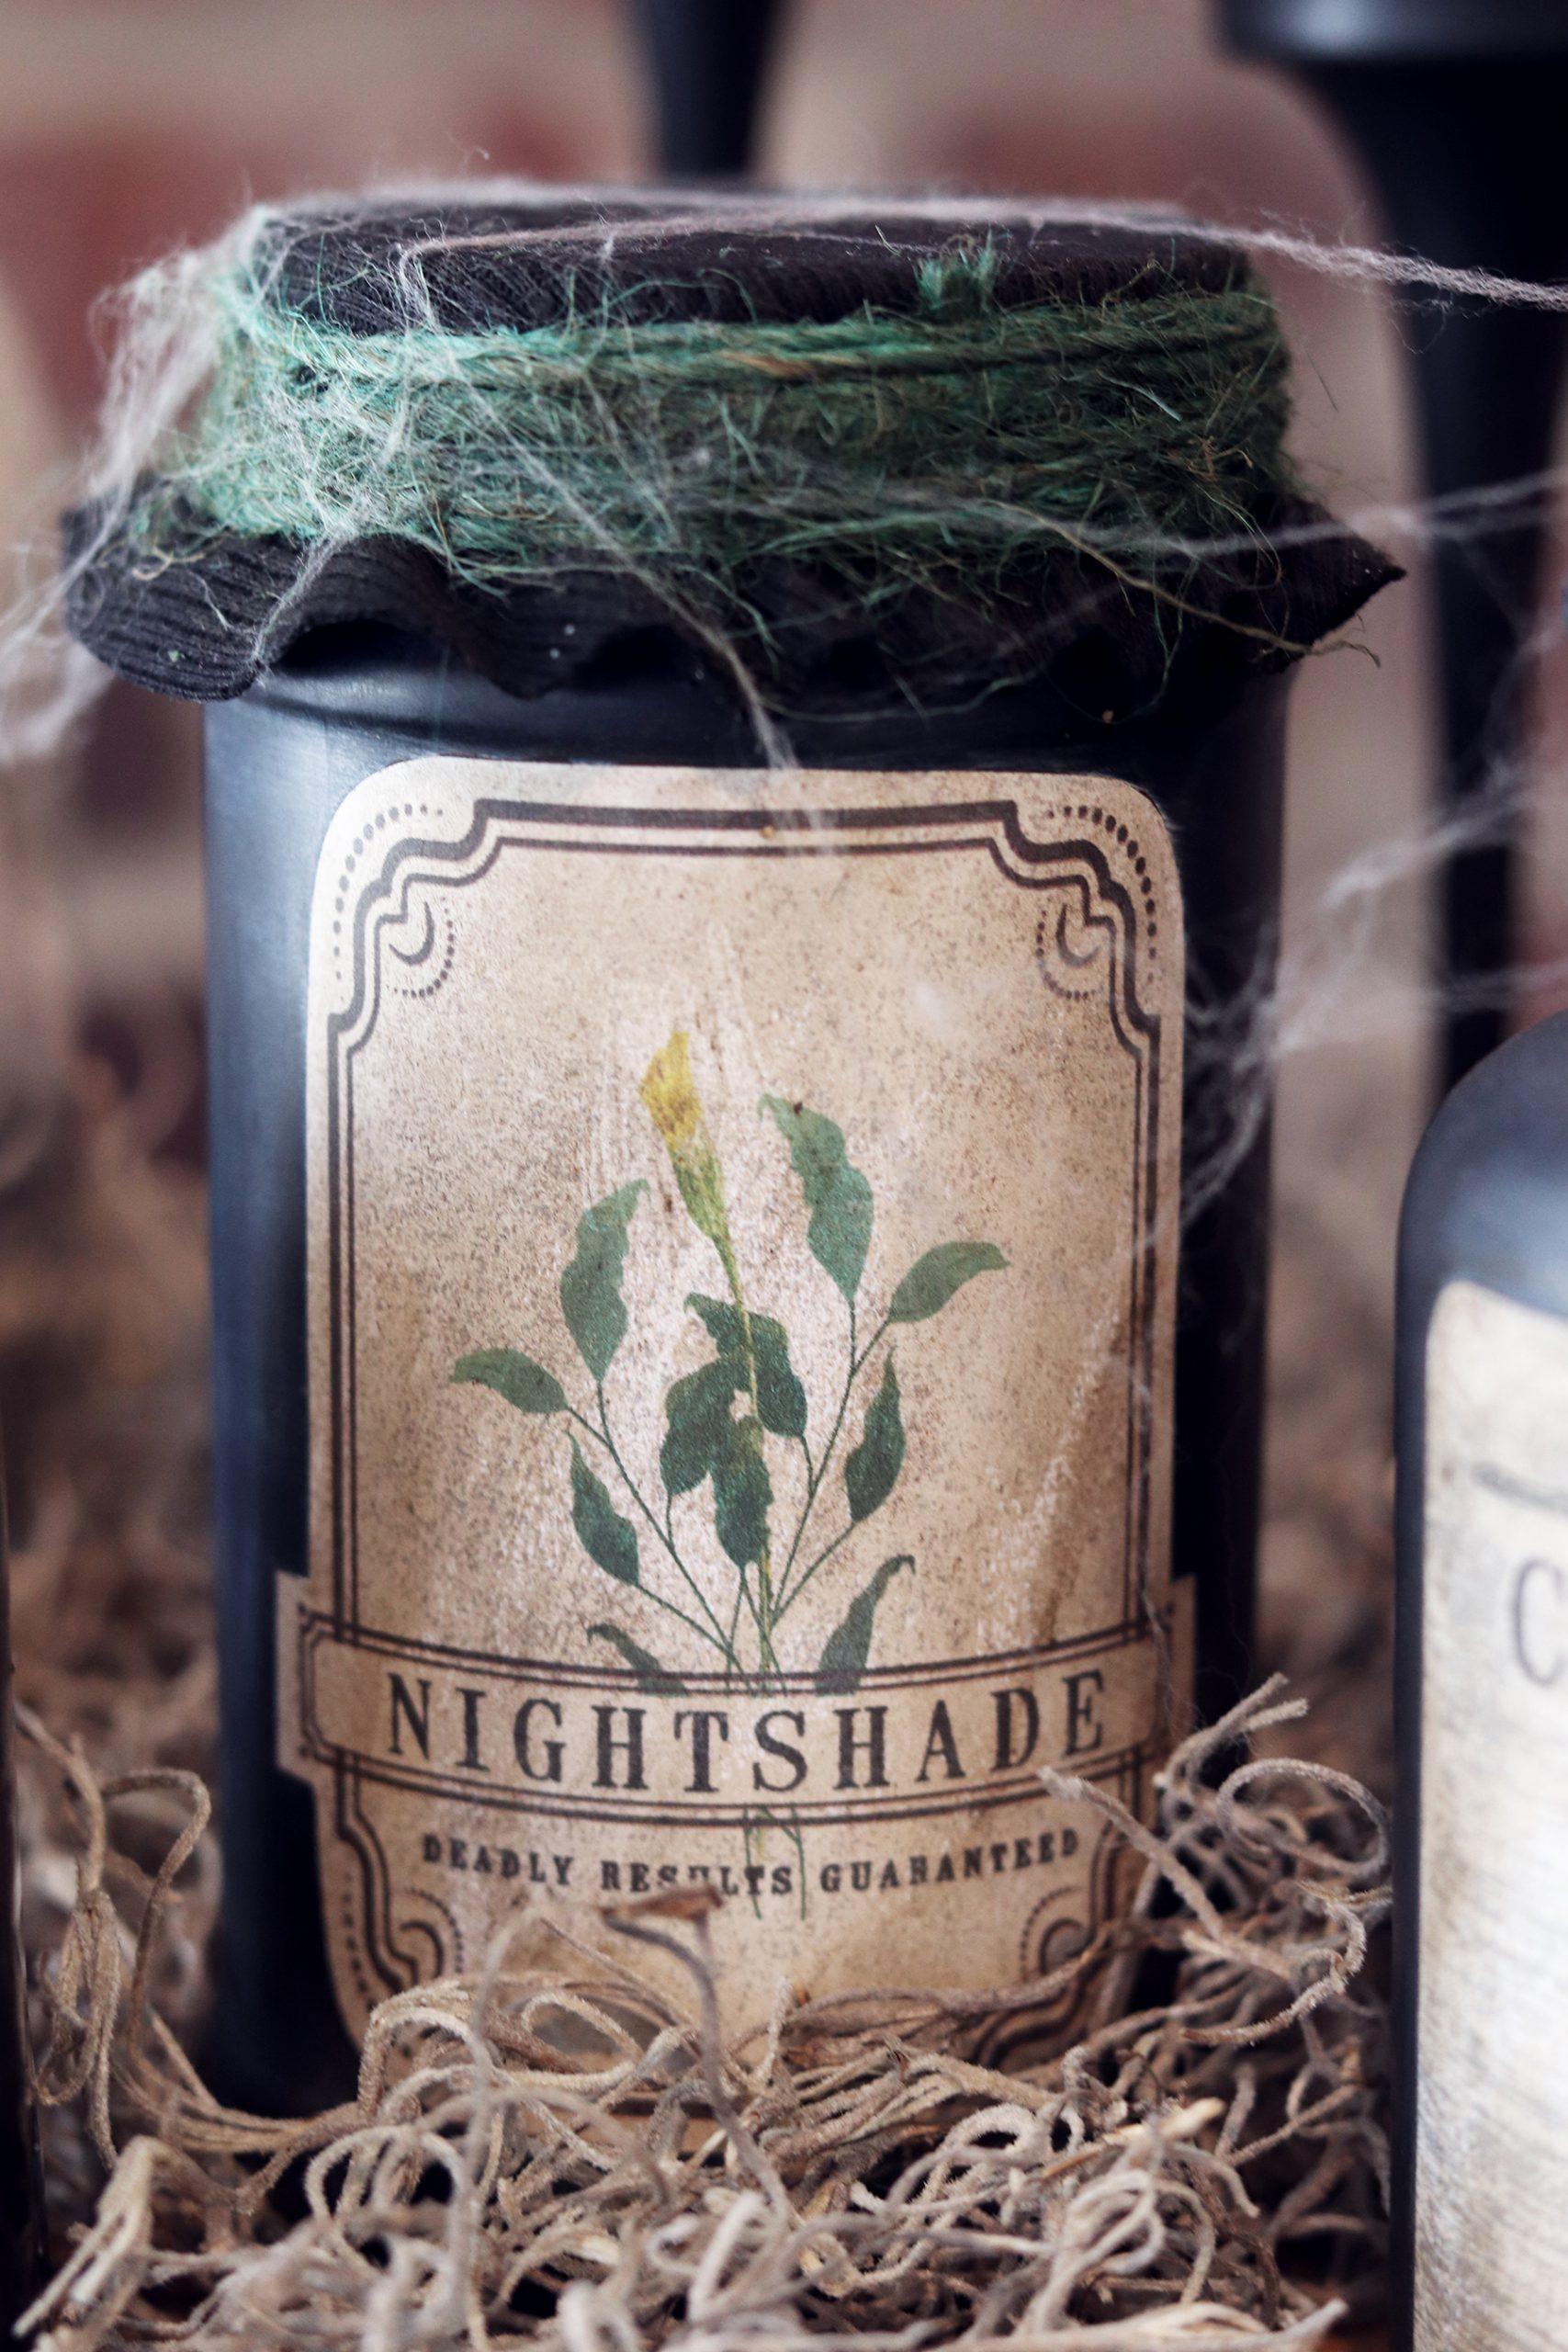 Boroughfare Nightshade Potion Bottle Halloween Decor